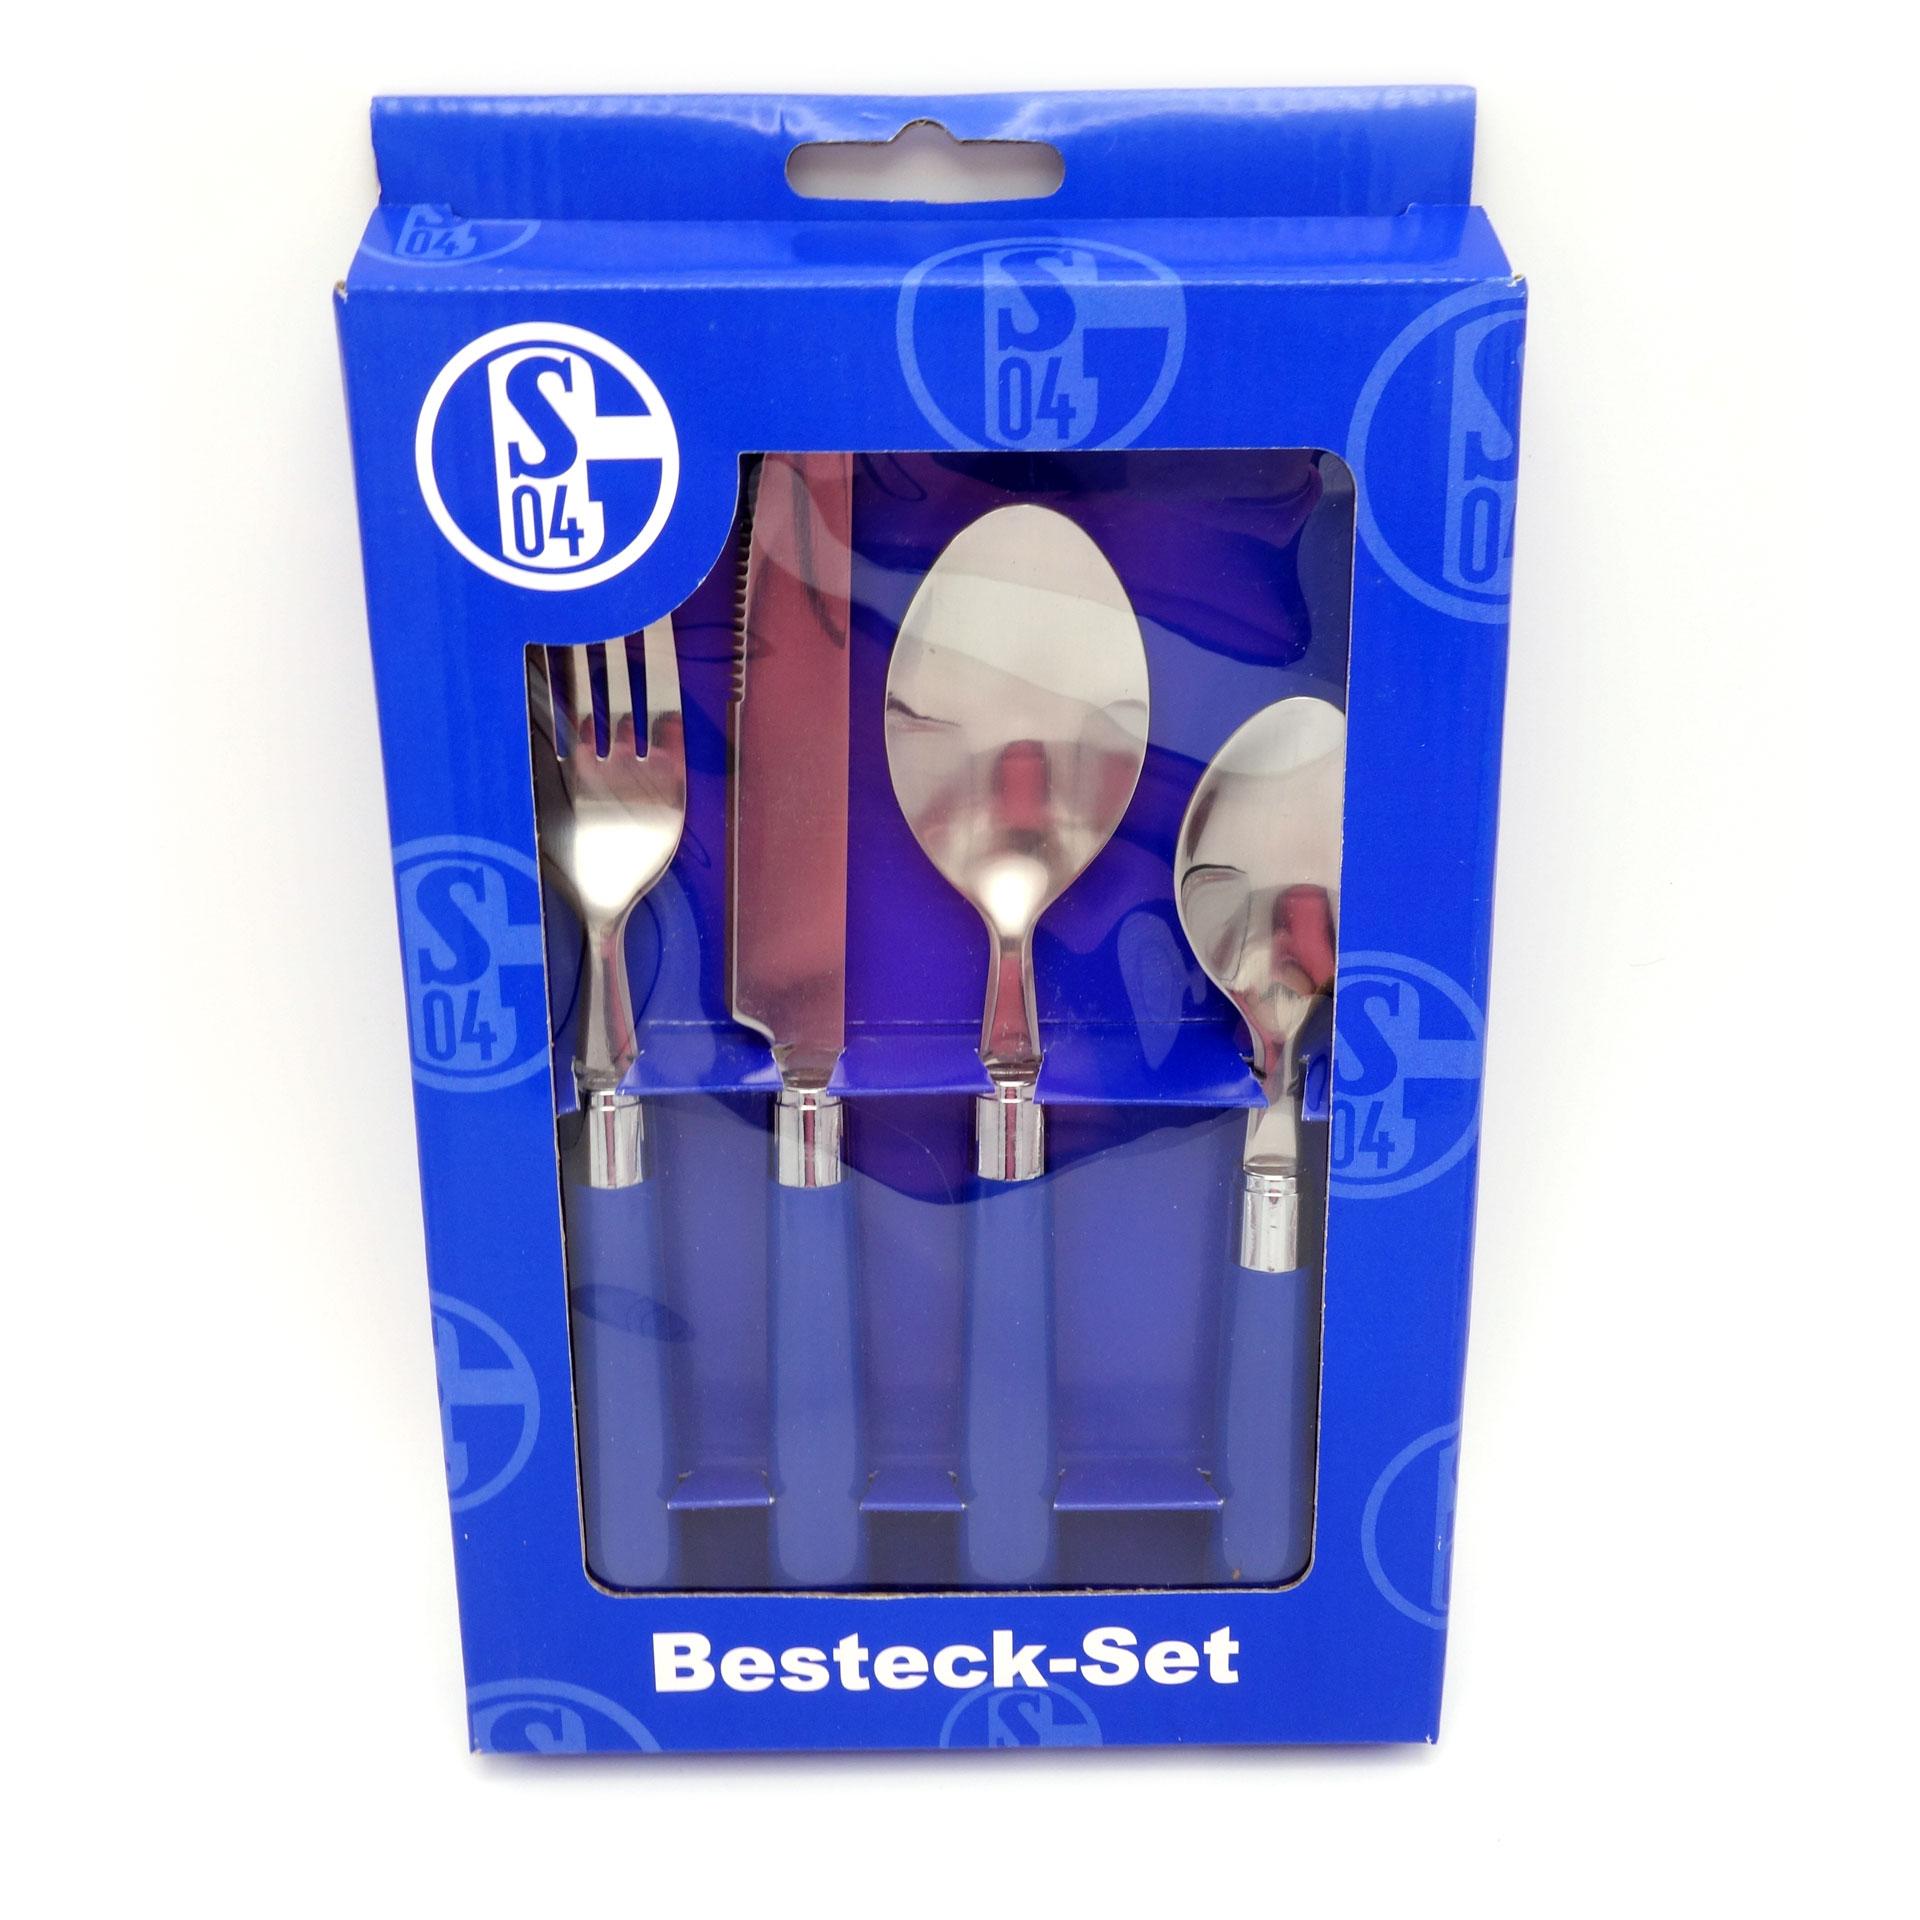 Schalke 04 Besteck Set 4 Teilig